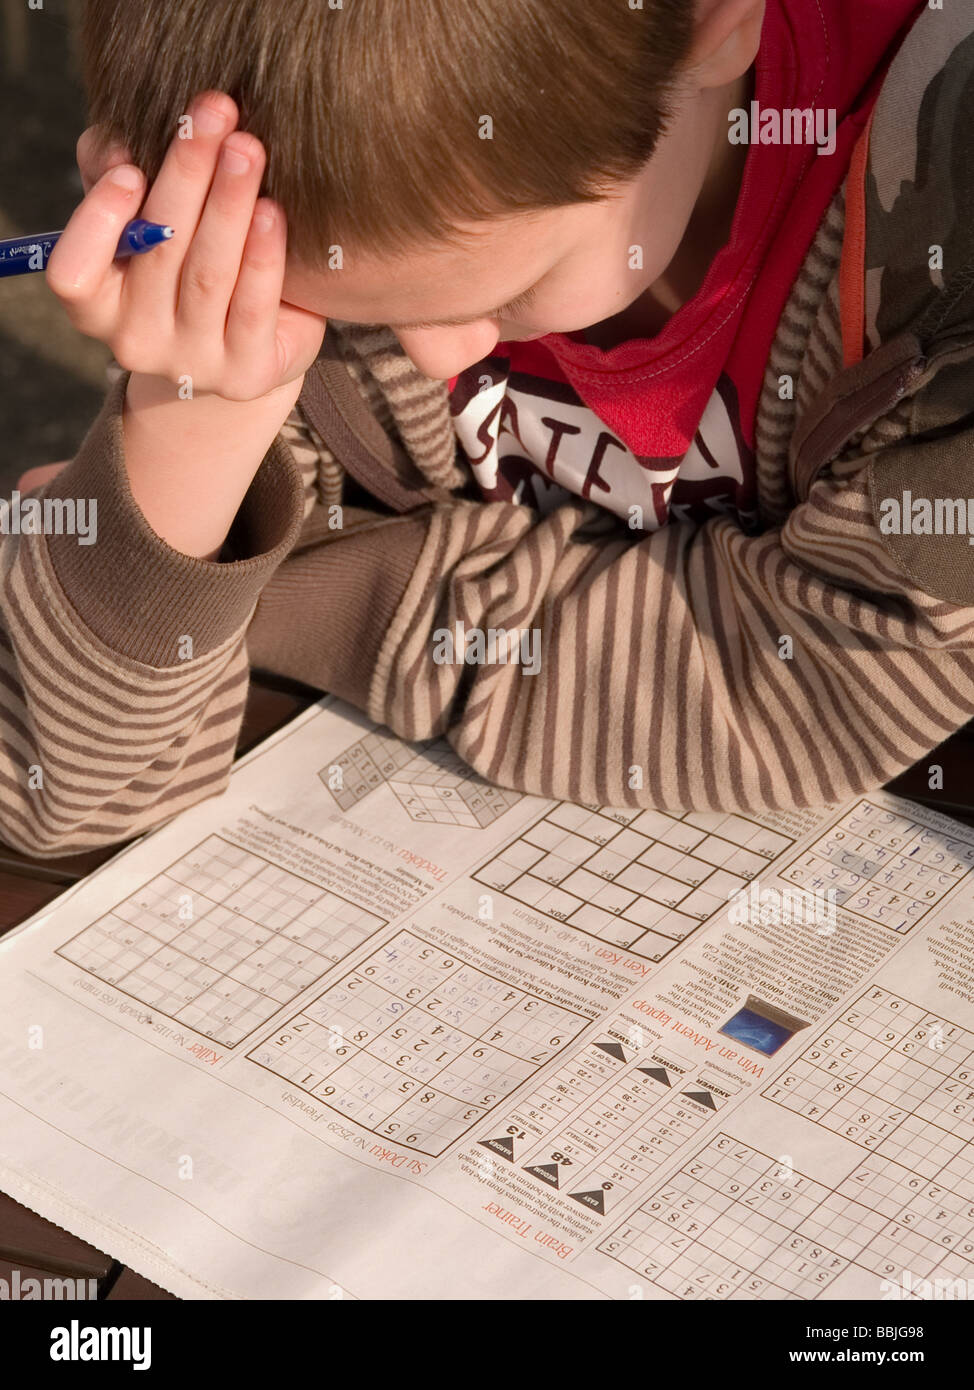 boy concentrating on suduko puzzle - Stock Image